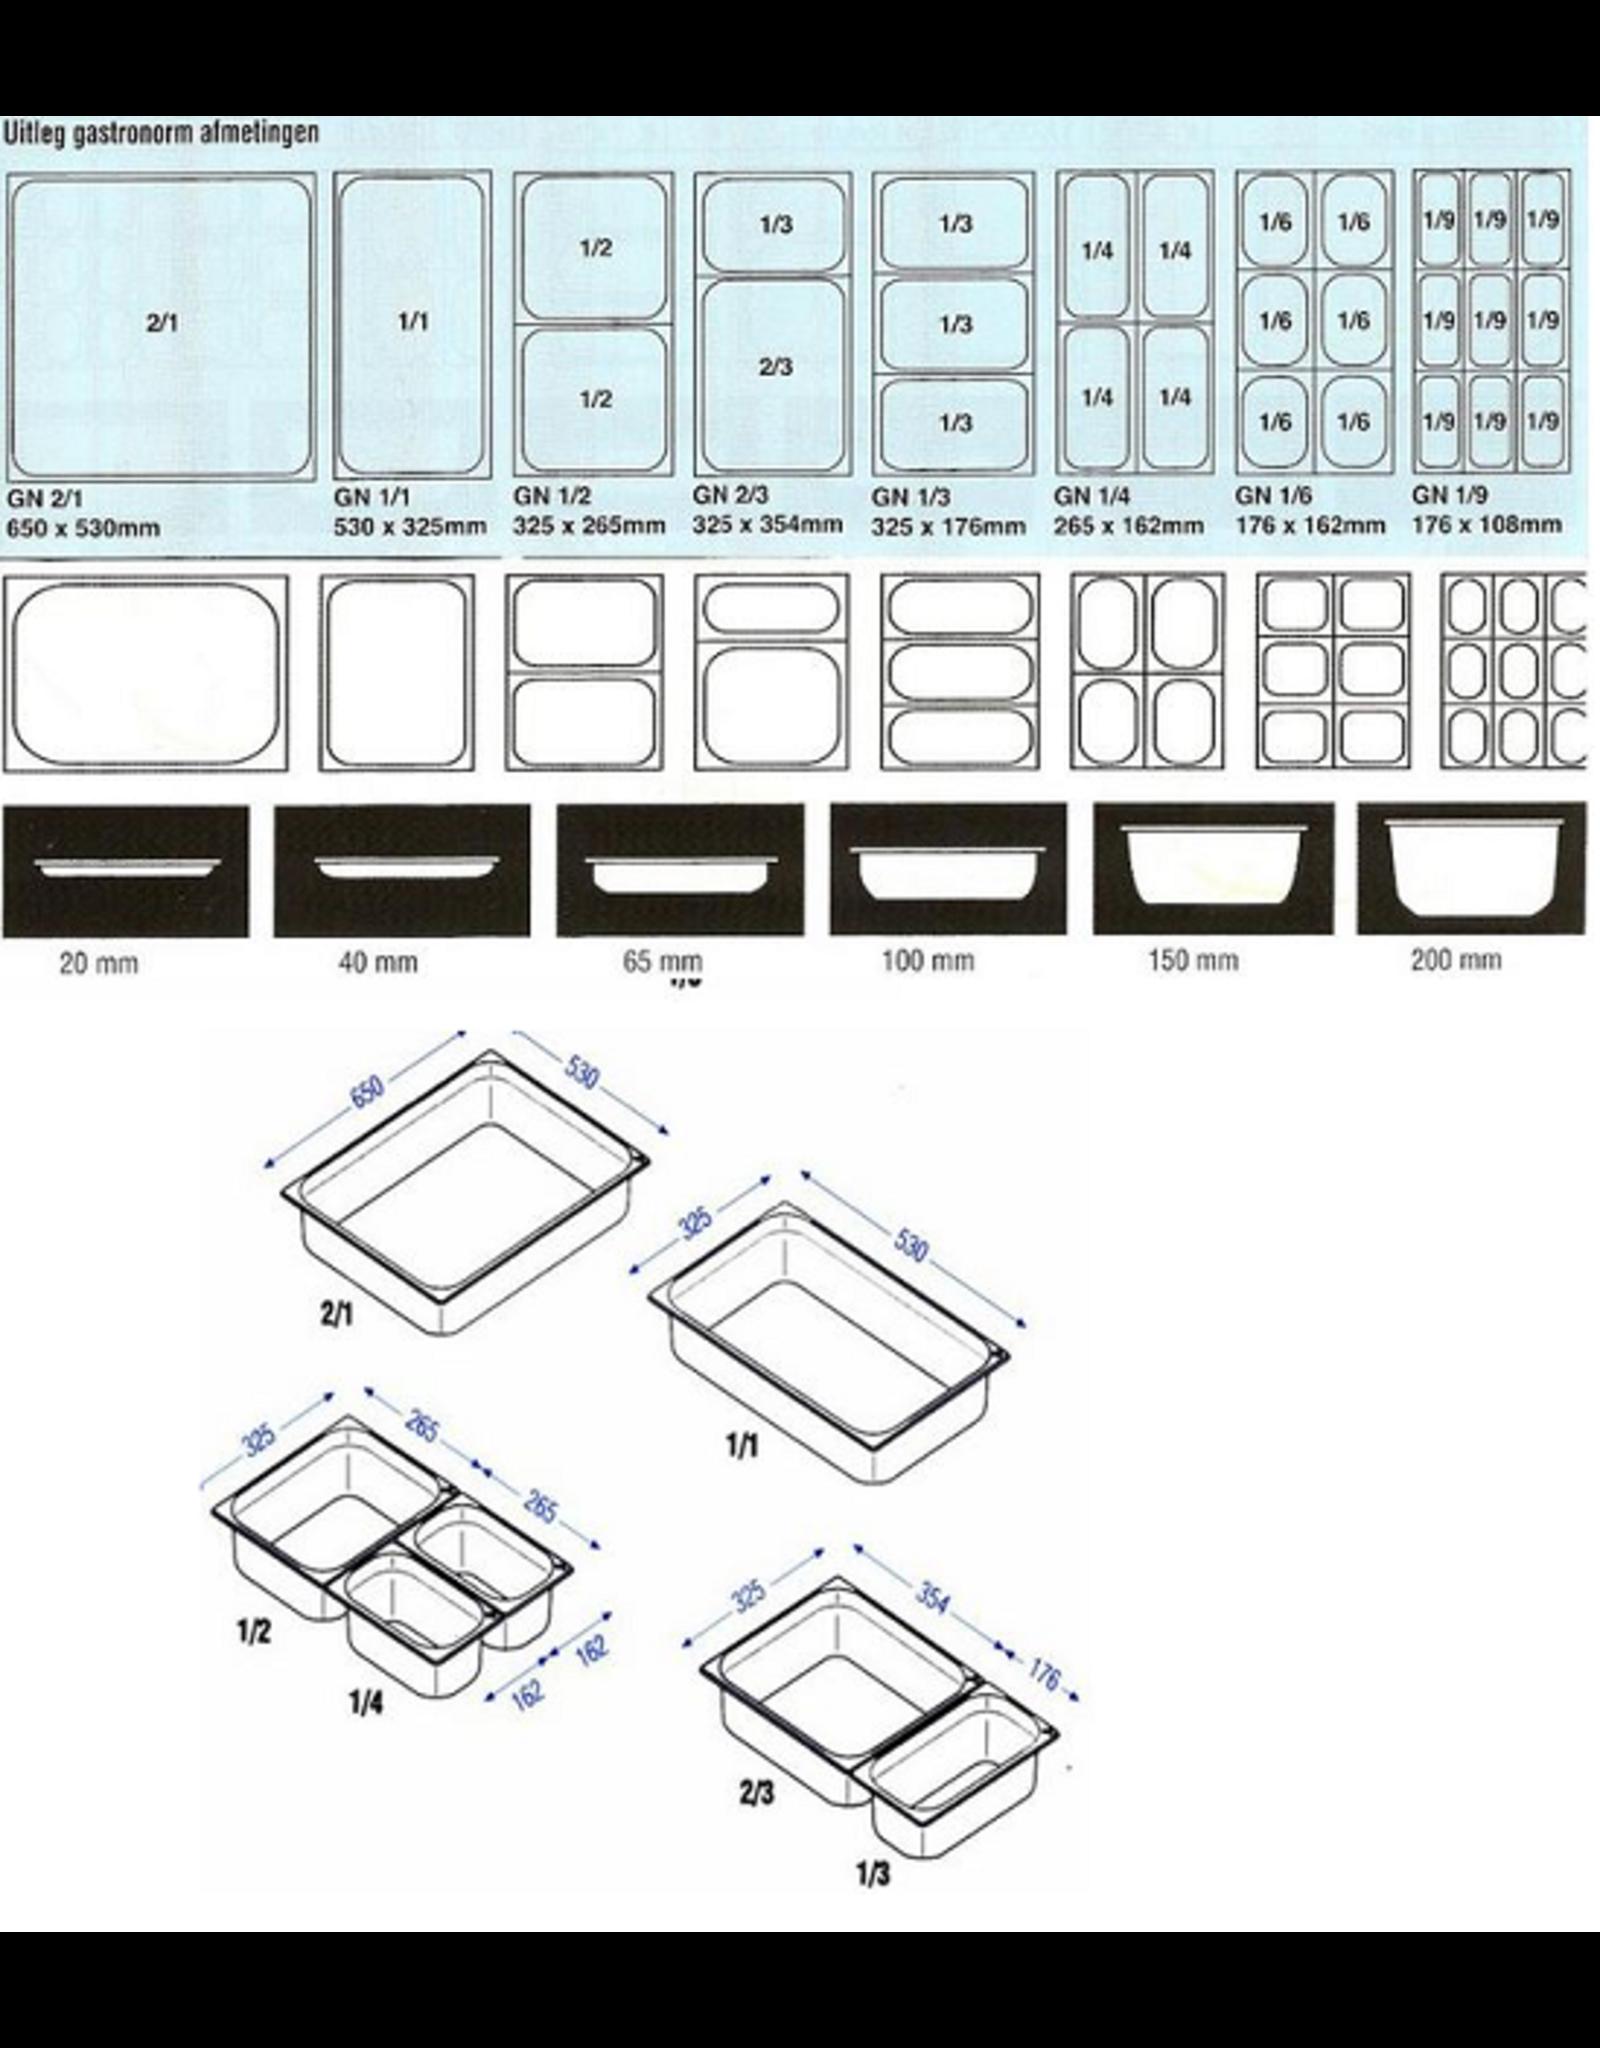 Q-Gastro Gastronorm Bak RVS 1/6 GN | 100mm | 176x162mm